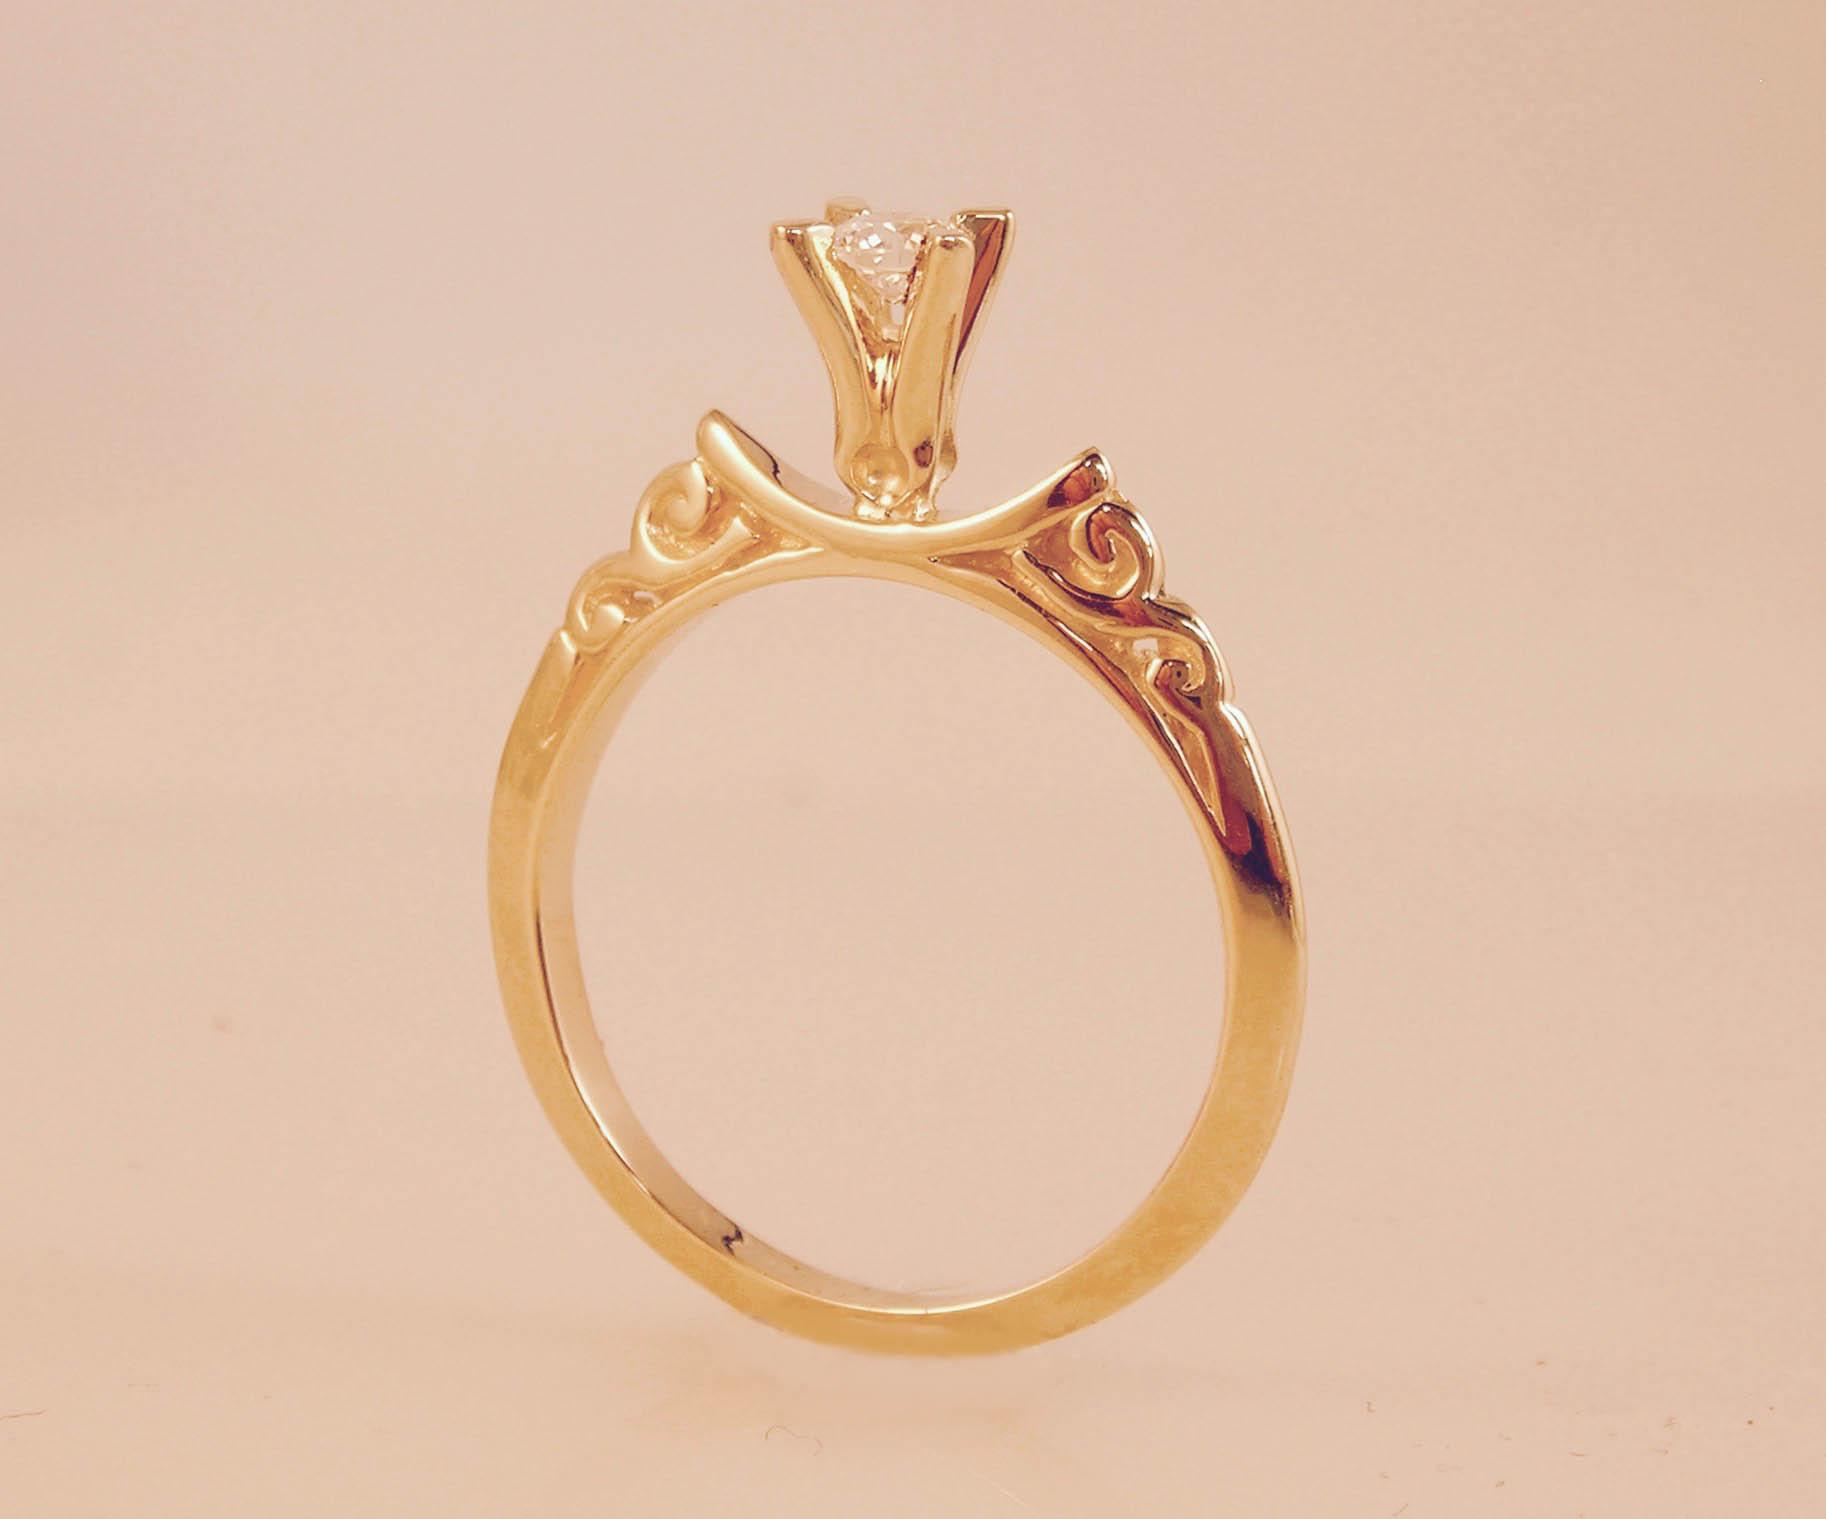 The Delicate Art Deco Ring